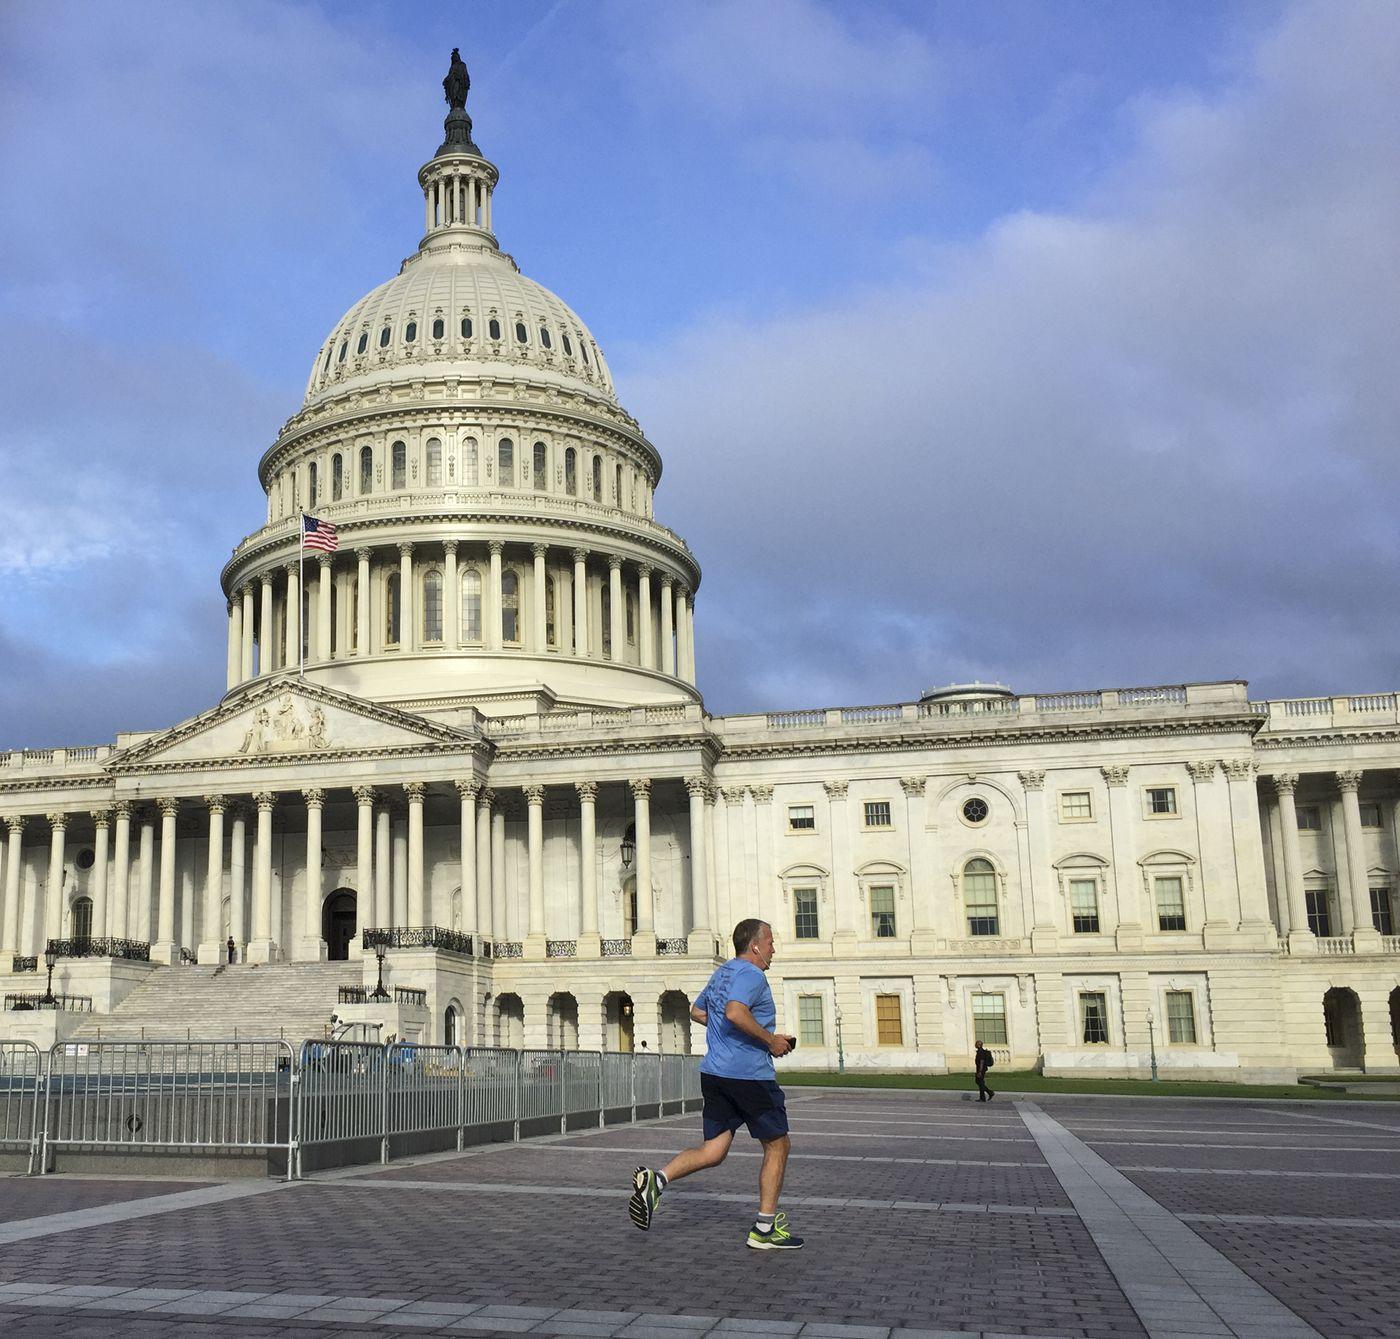 Sen. Dan Sullivan passes the U.S. Capitol on a morning run in Washington, D.C., on June 19, 2019. (Marc Lester / ADN)